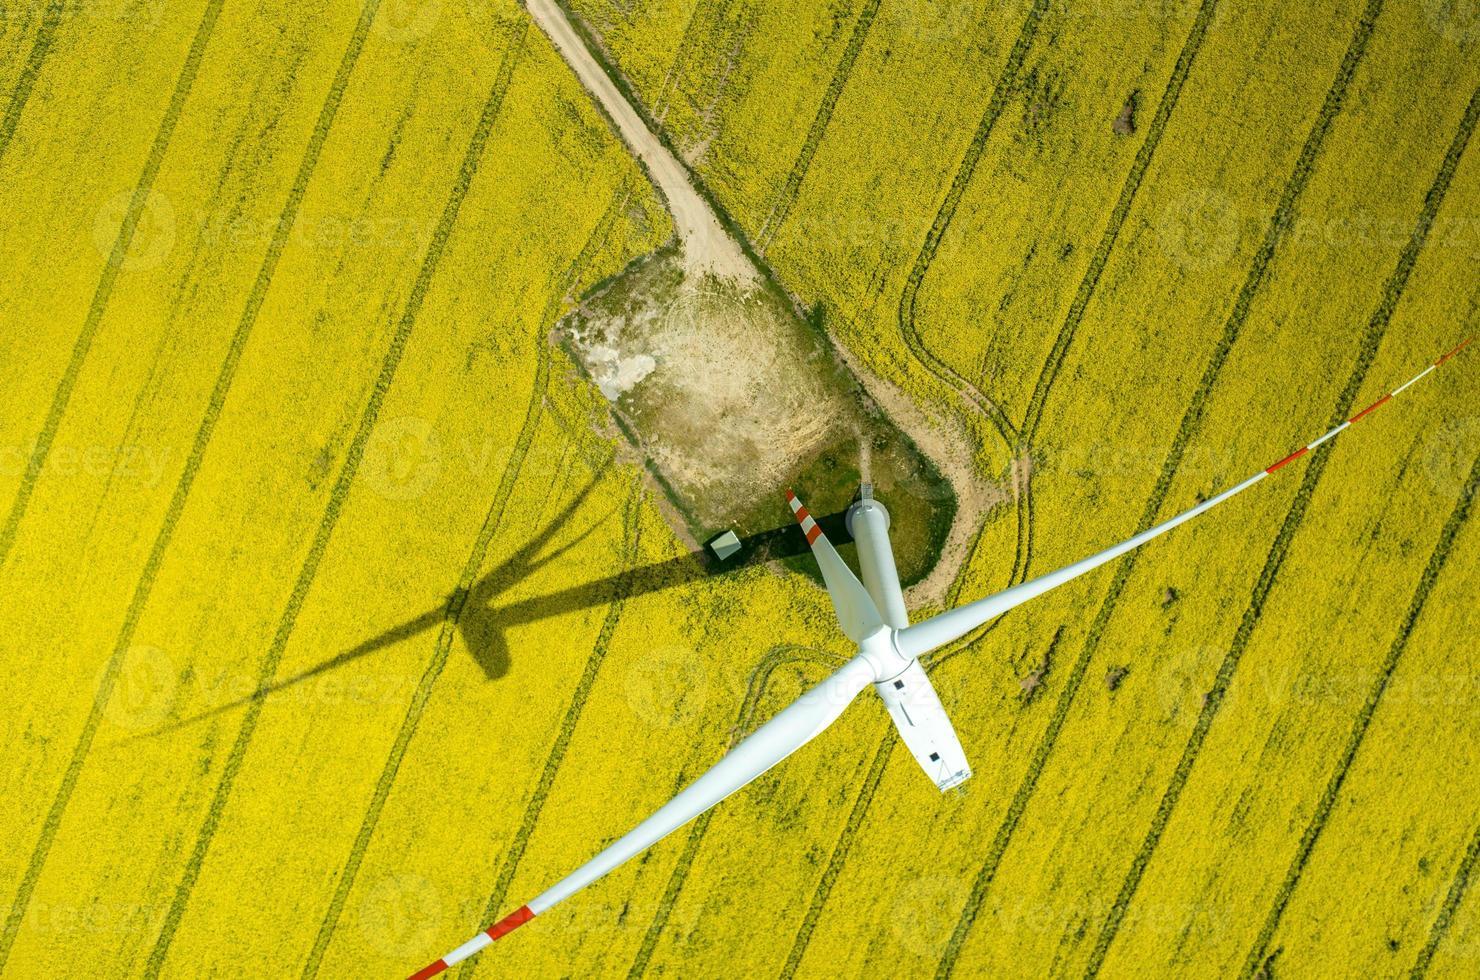 Windmills aerial view photo